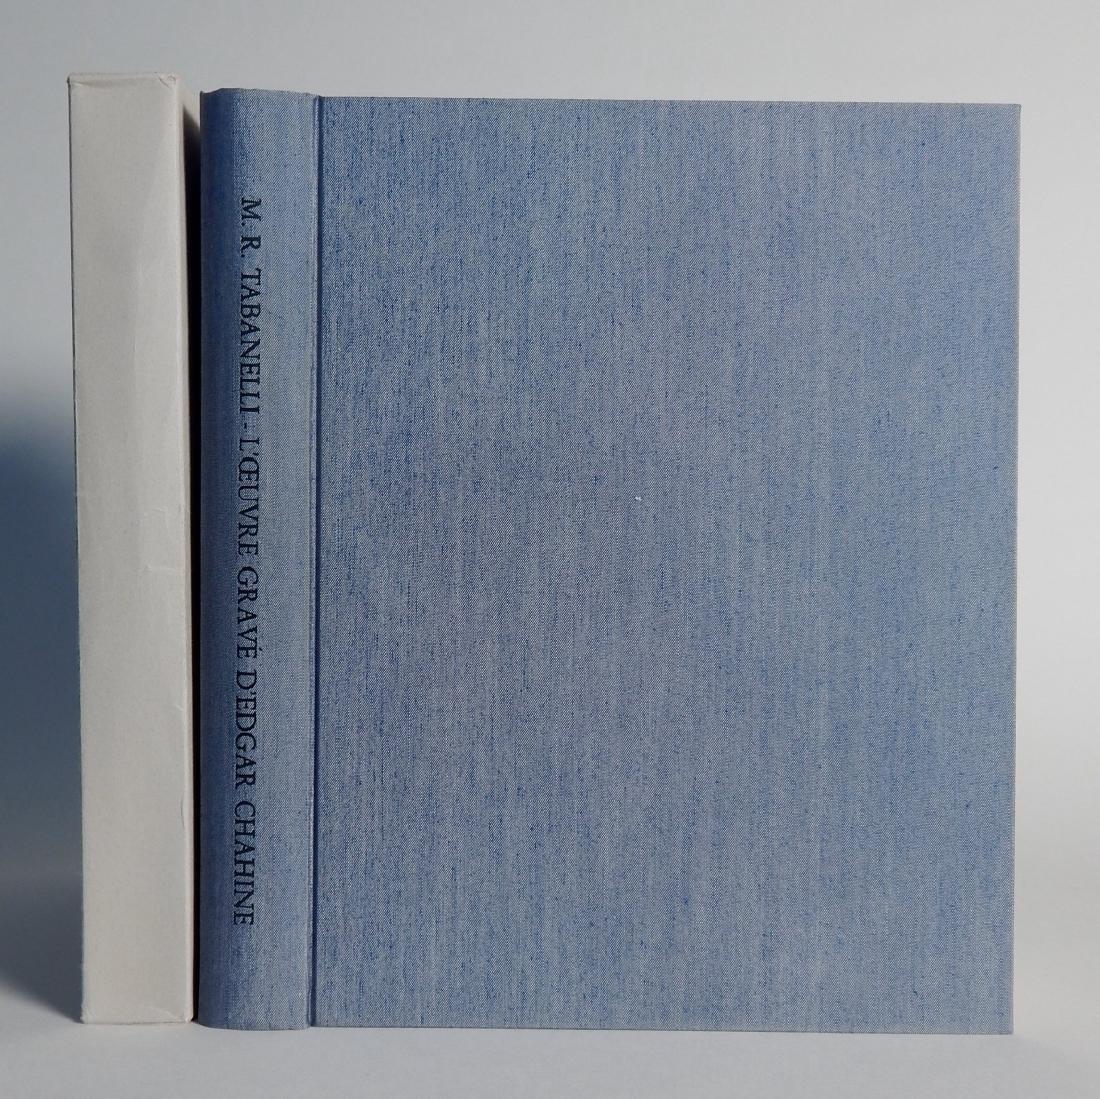 Tabanelli- Edgar Chahine Catalogue de L'oeuvre...